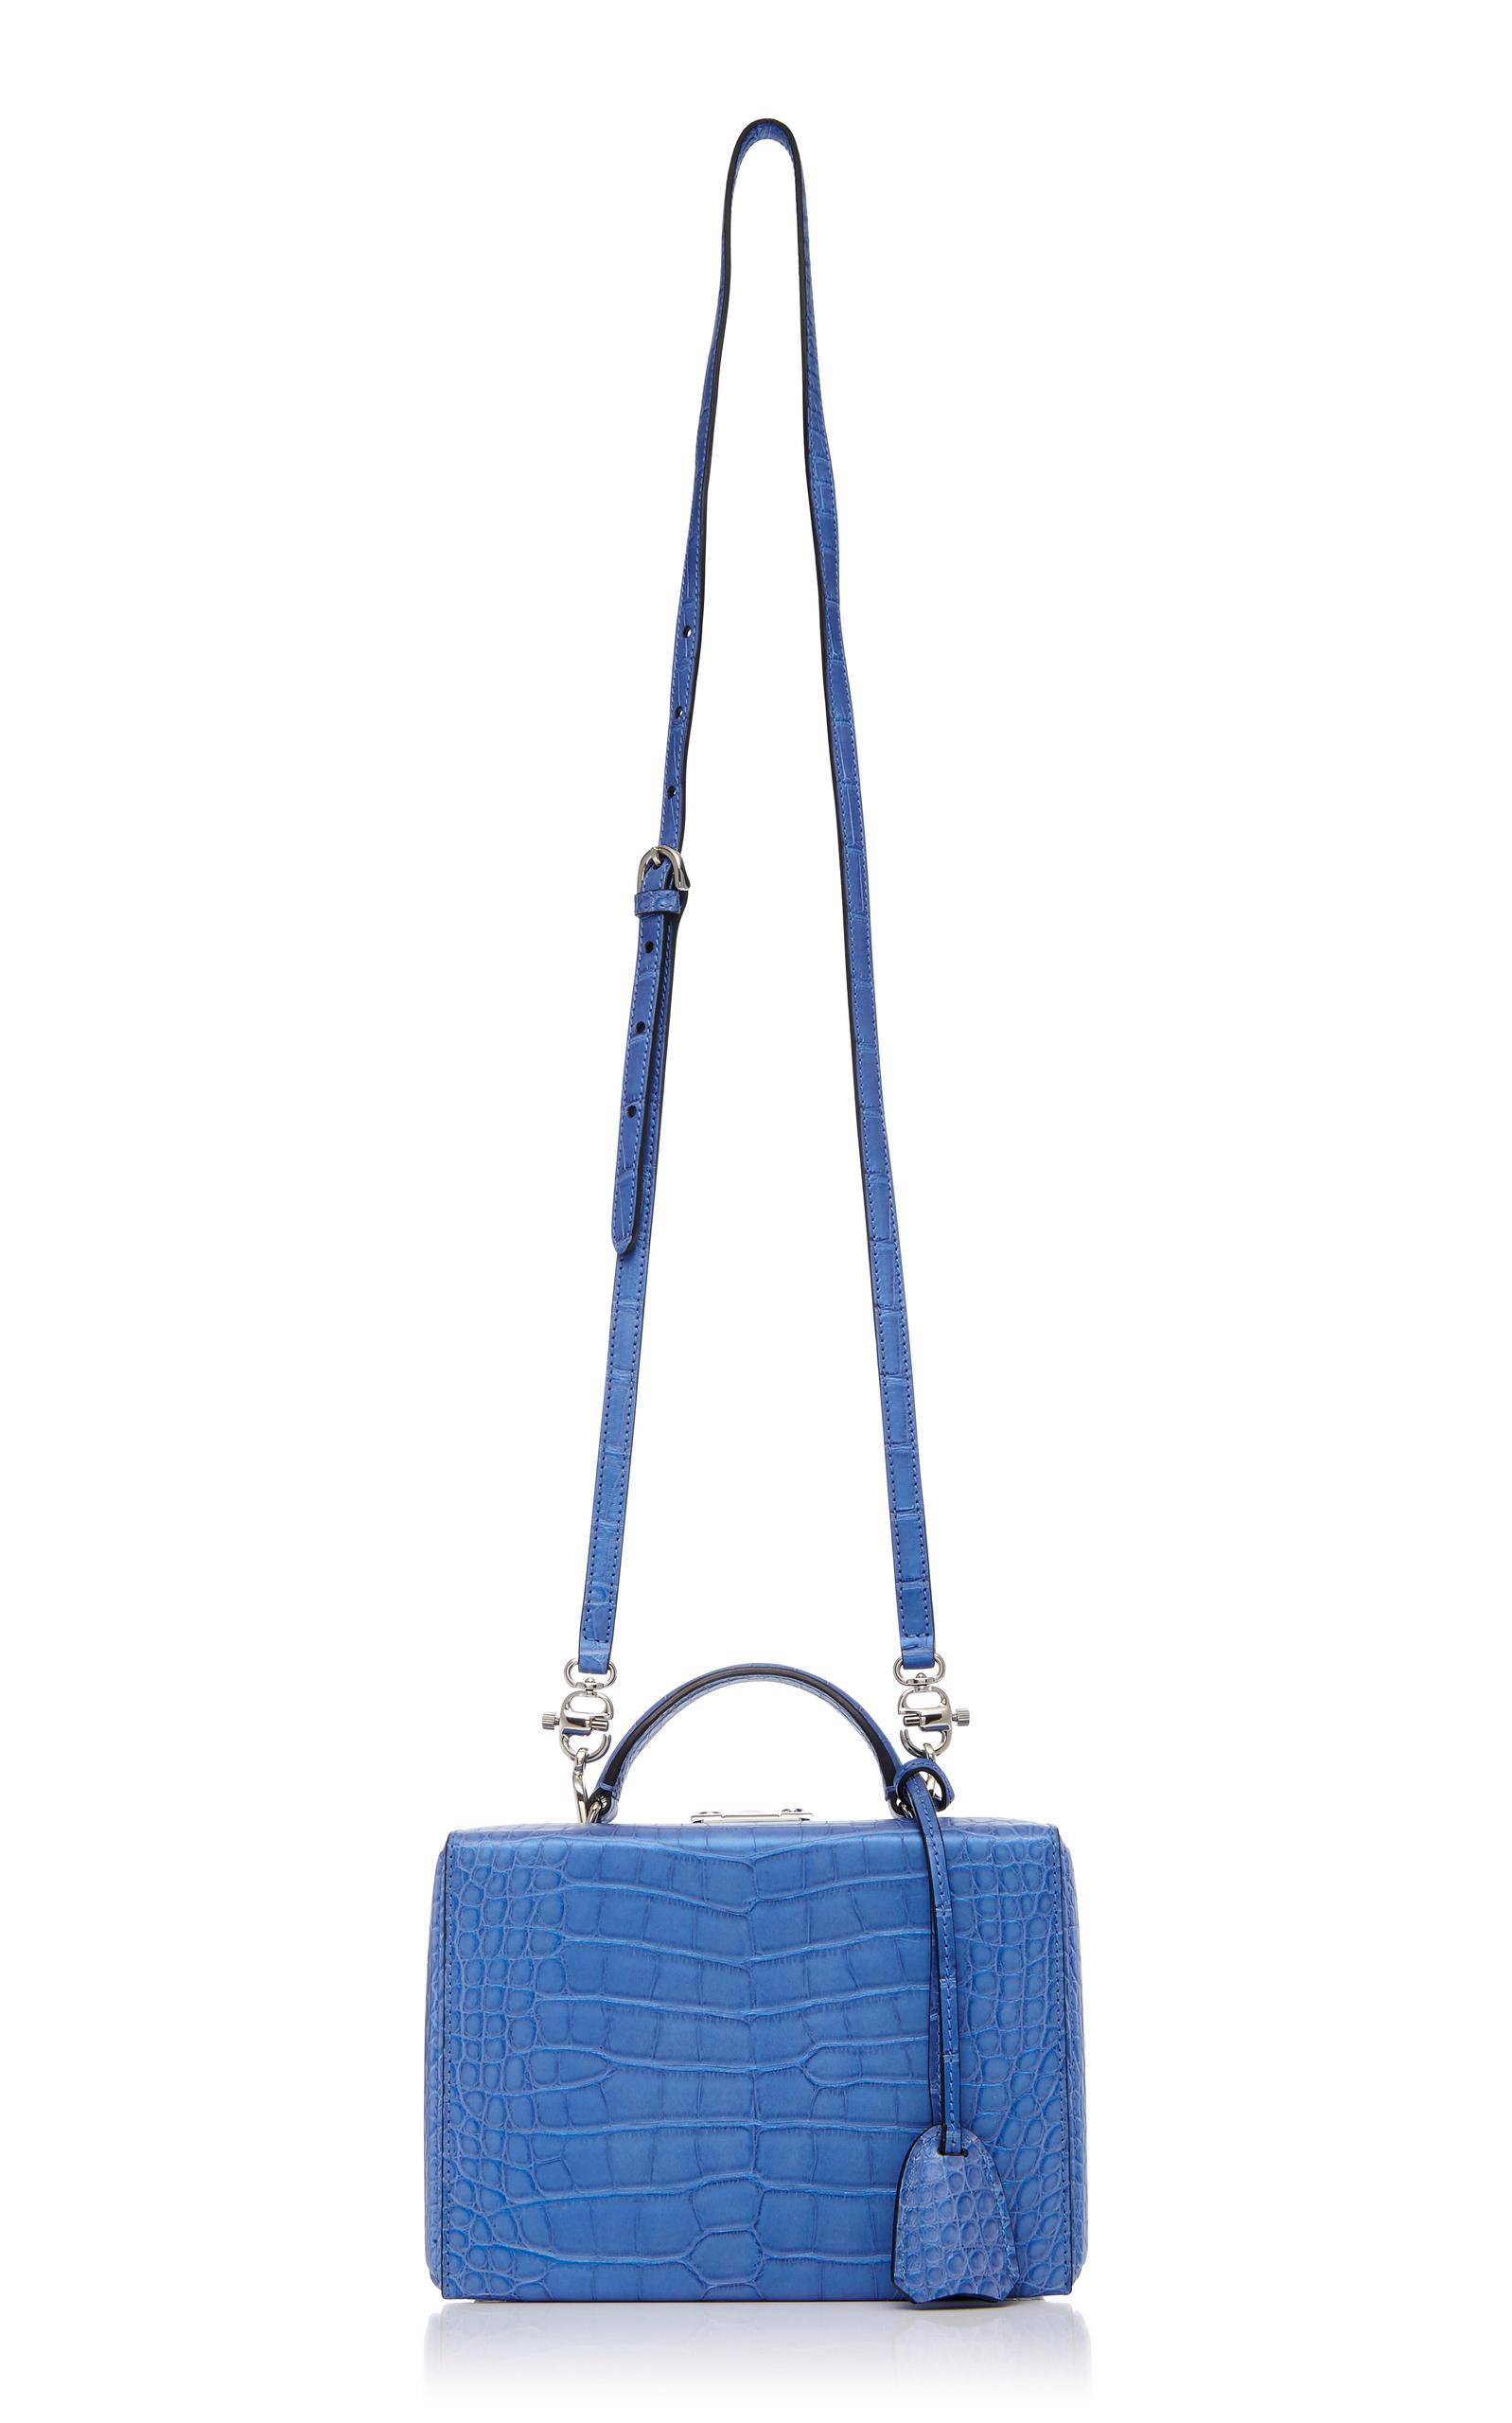 Mark Cross Small Alligator Grace Box Bag in Blue